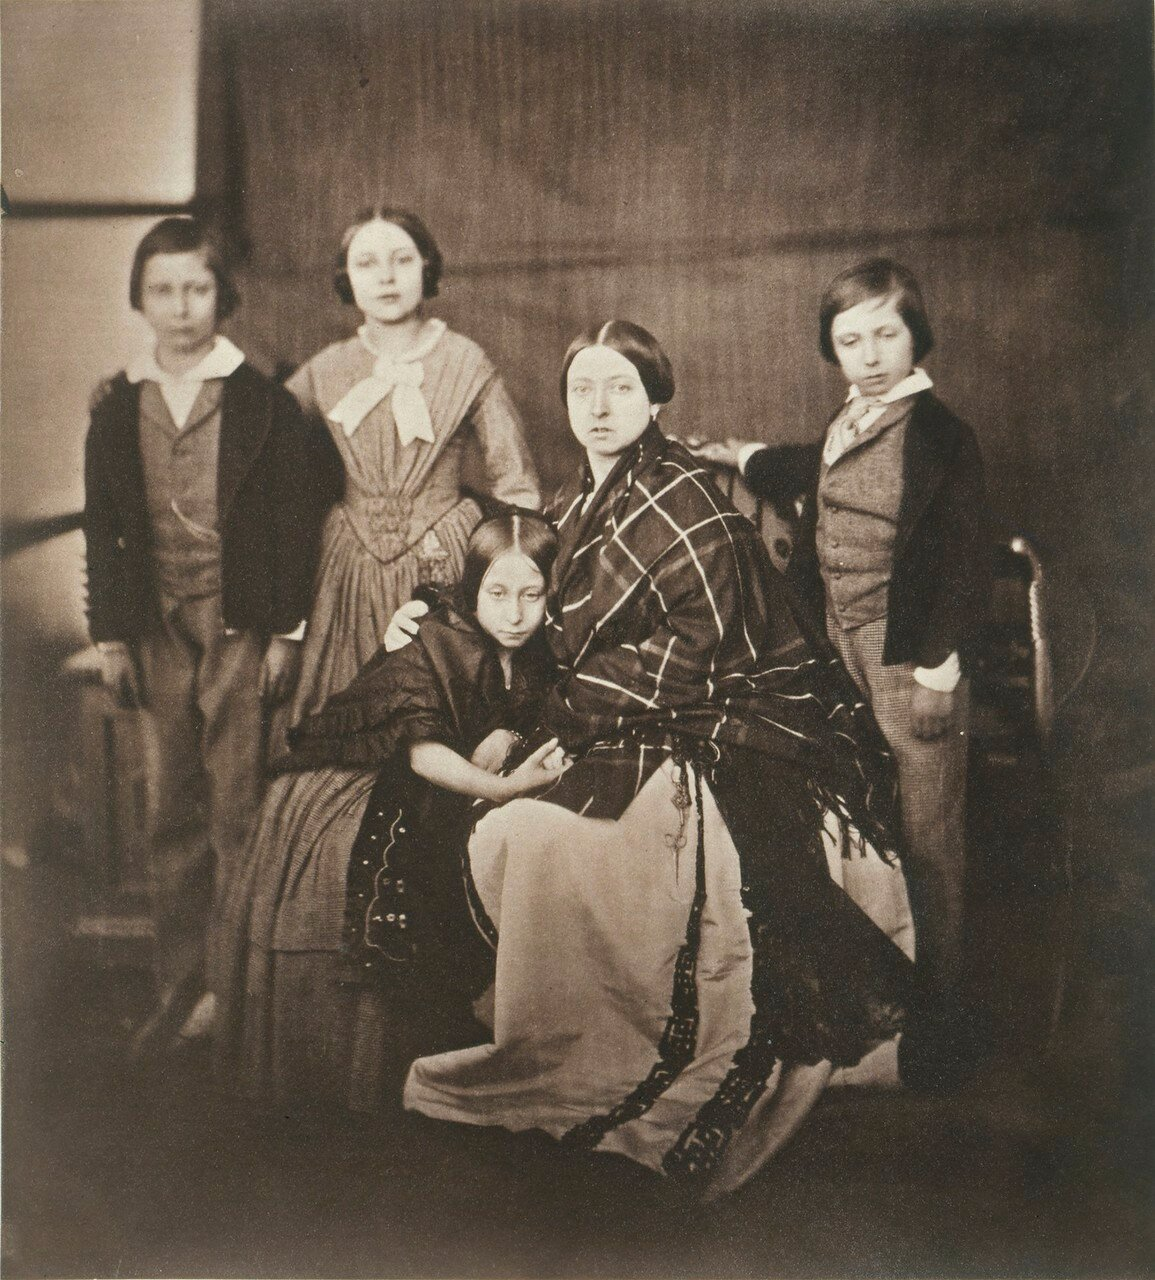 1854. Принц Уэльский, принцесса Алиса, королева Виктория, принц Альфред